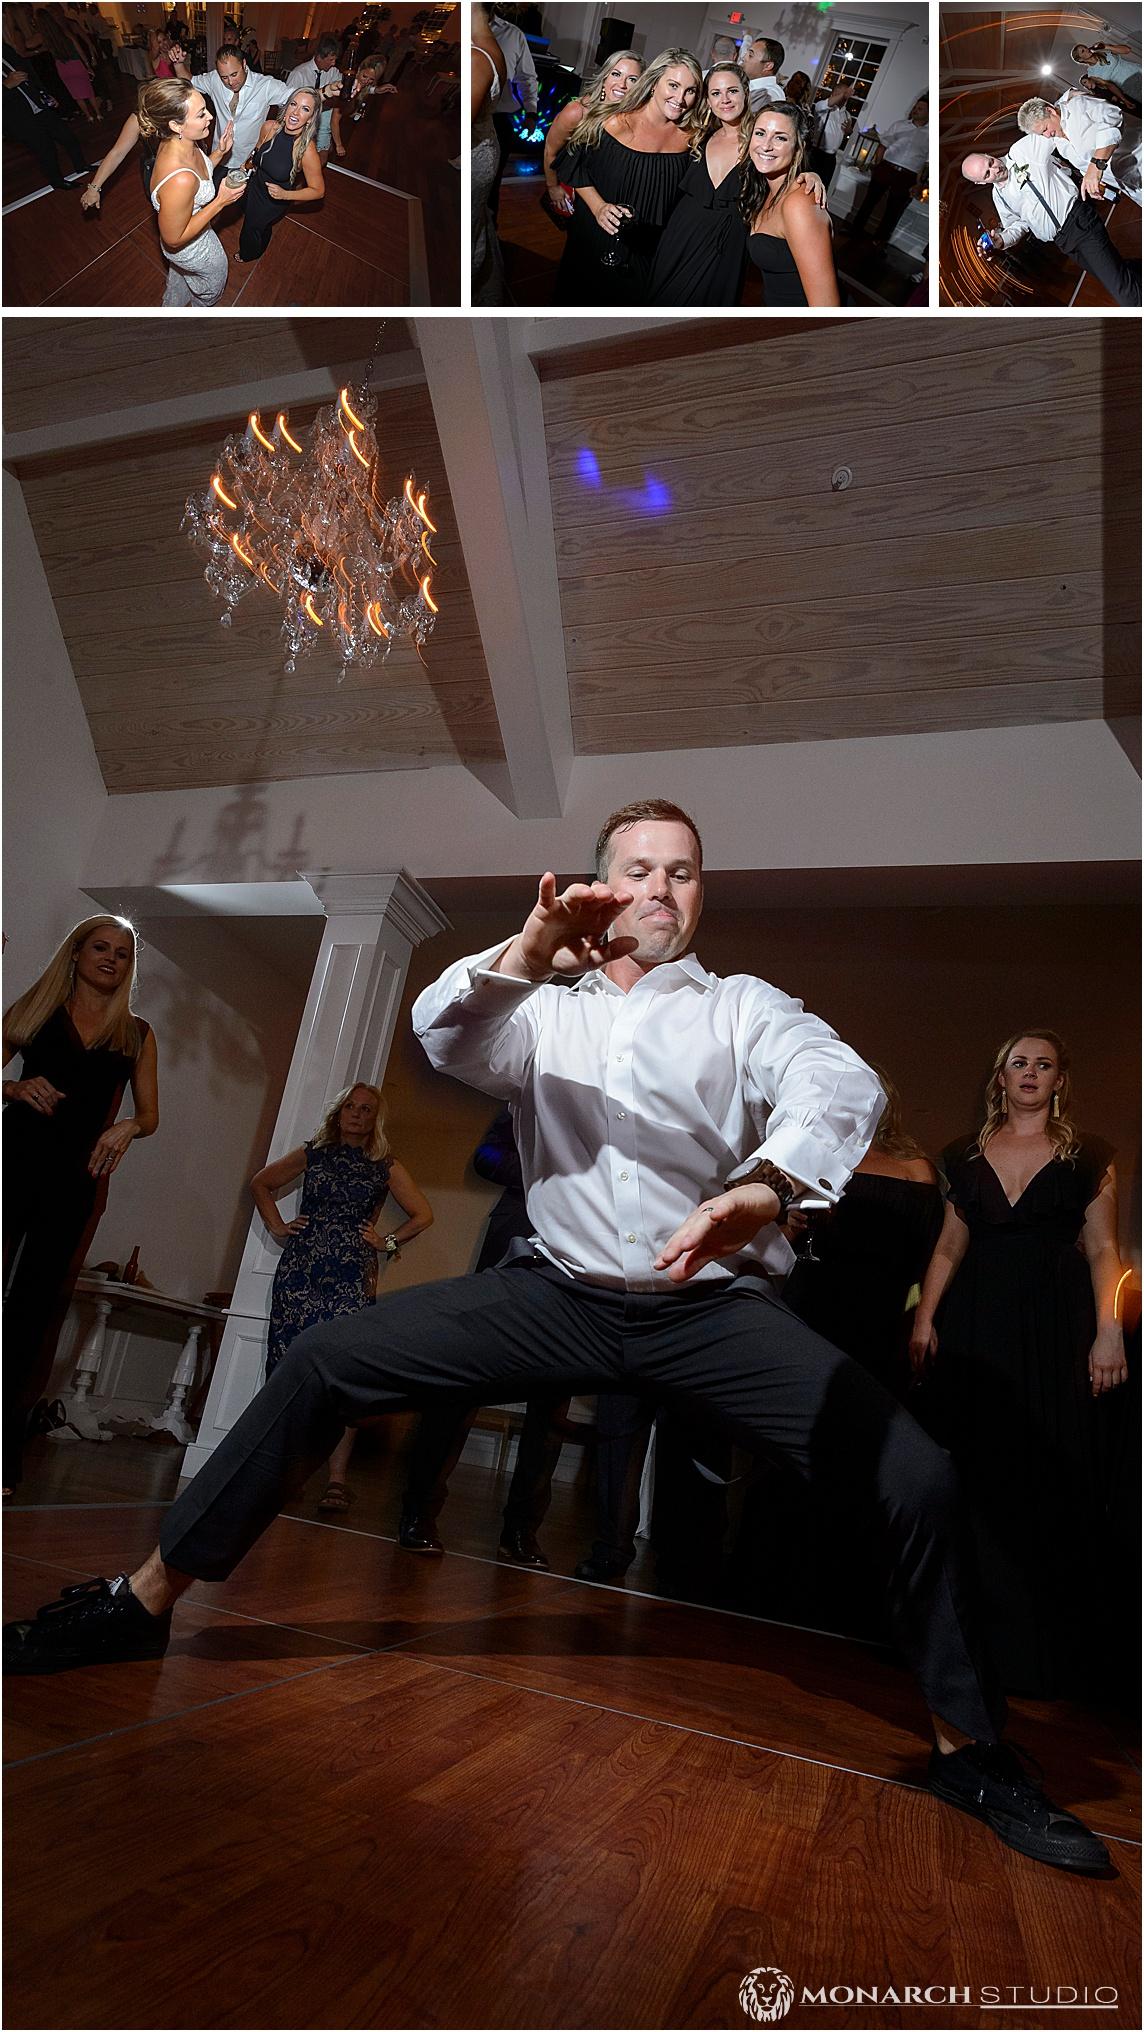 120-whiteroom-wedding-photographer-2019-05-22_0102.jpg